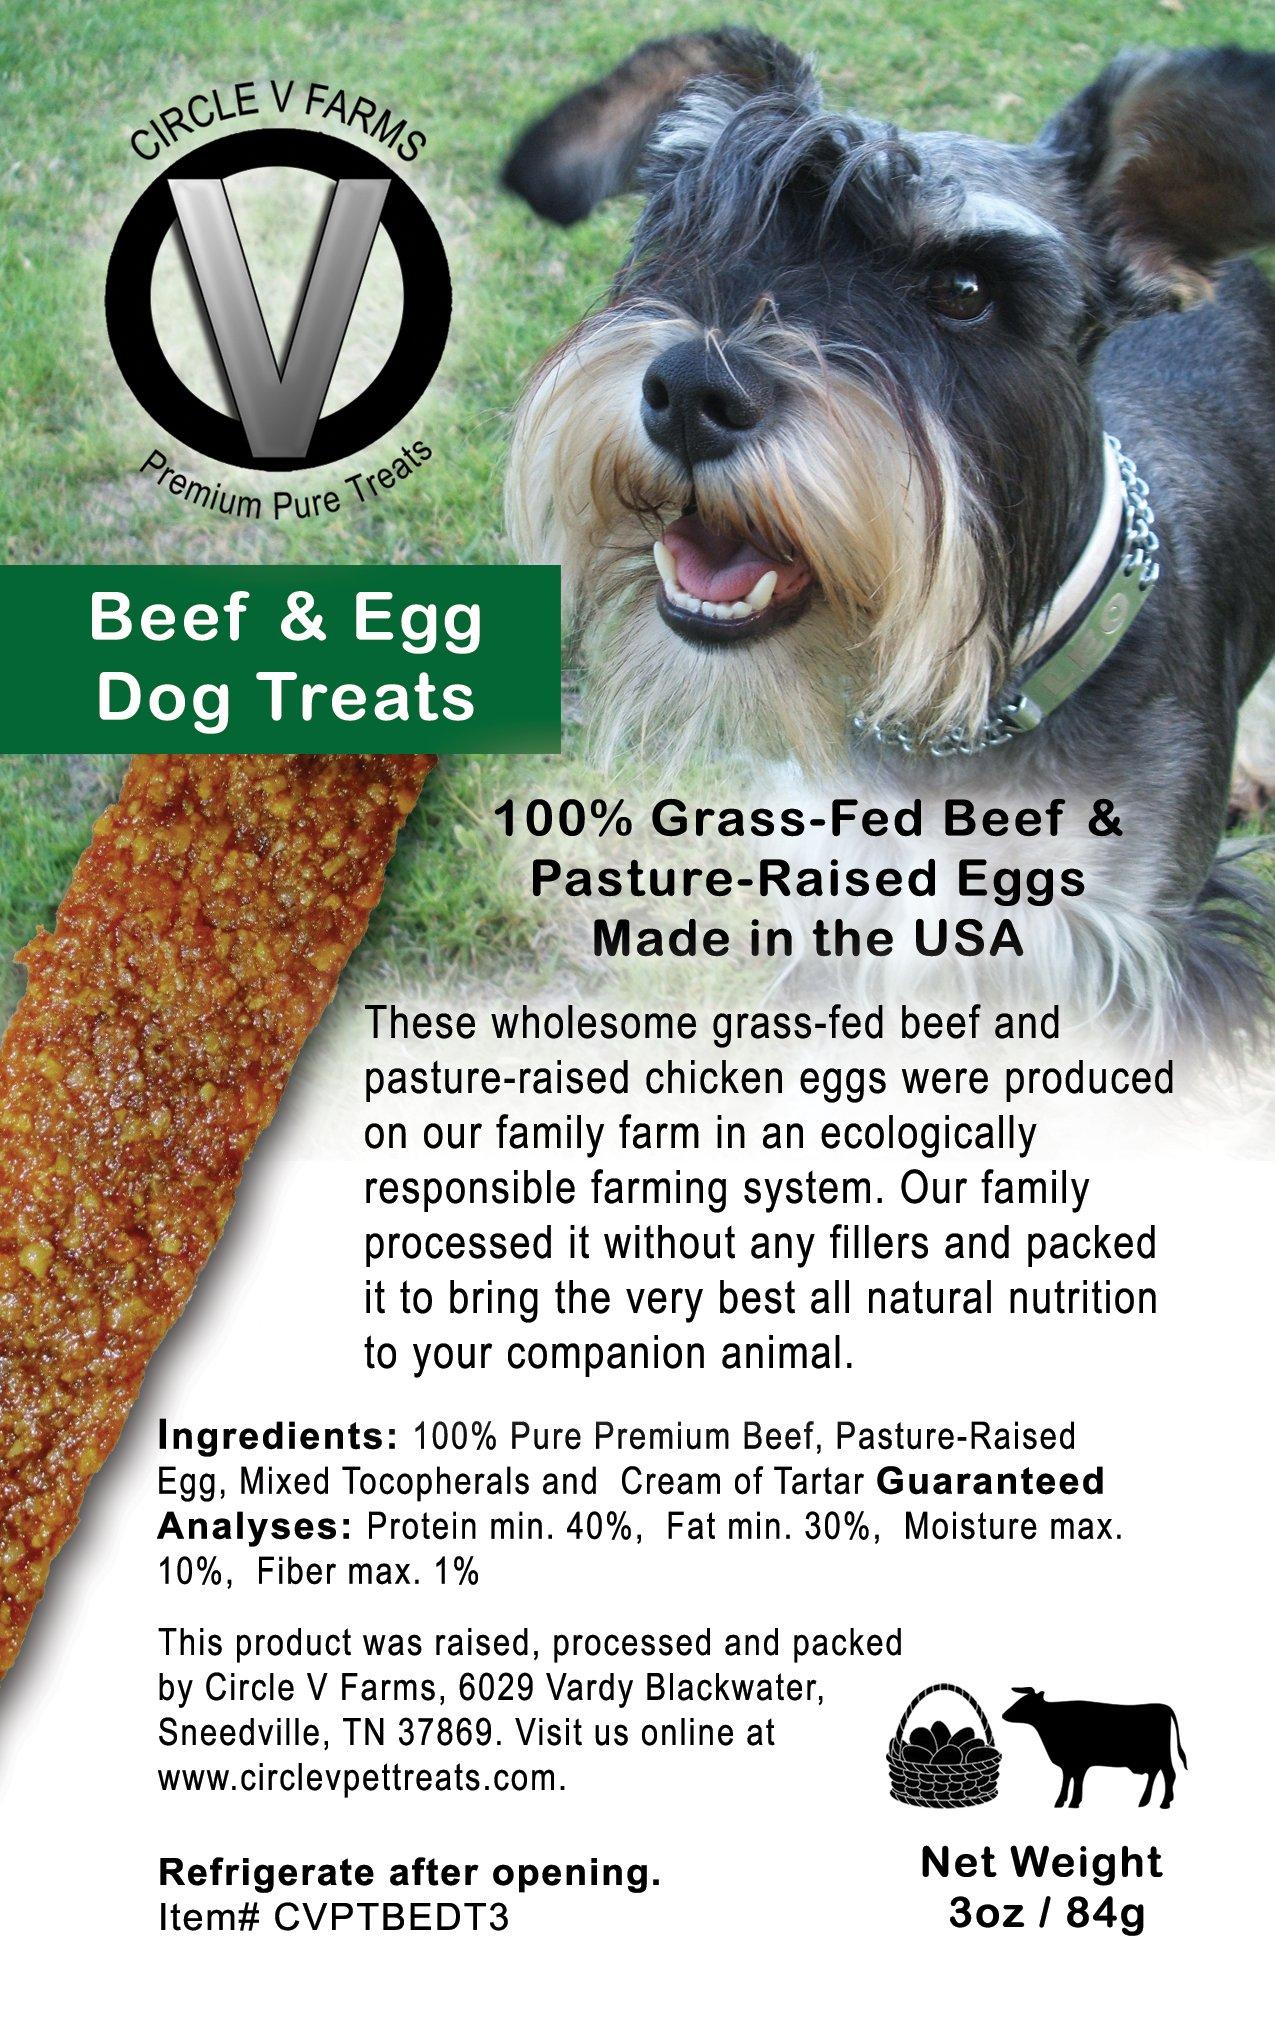 Circle V Beef & Egg Dog Treats